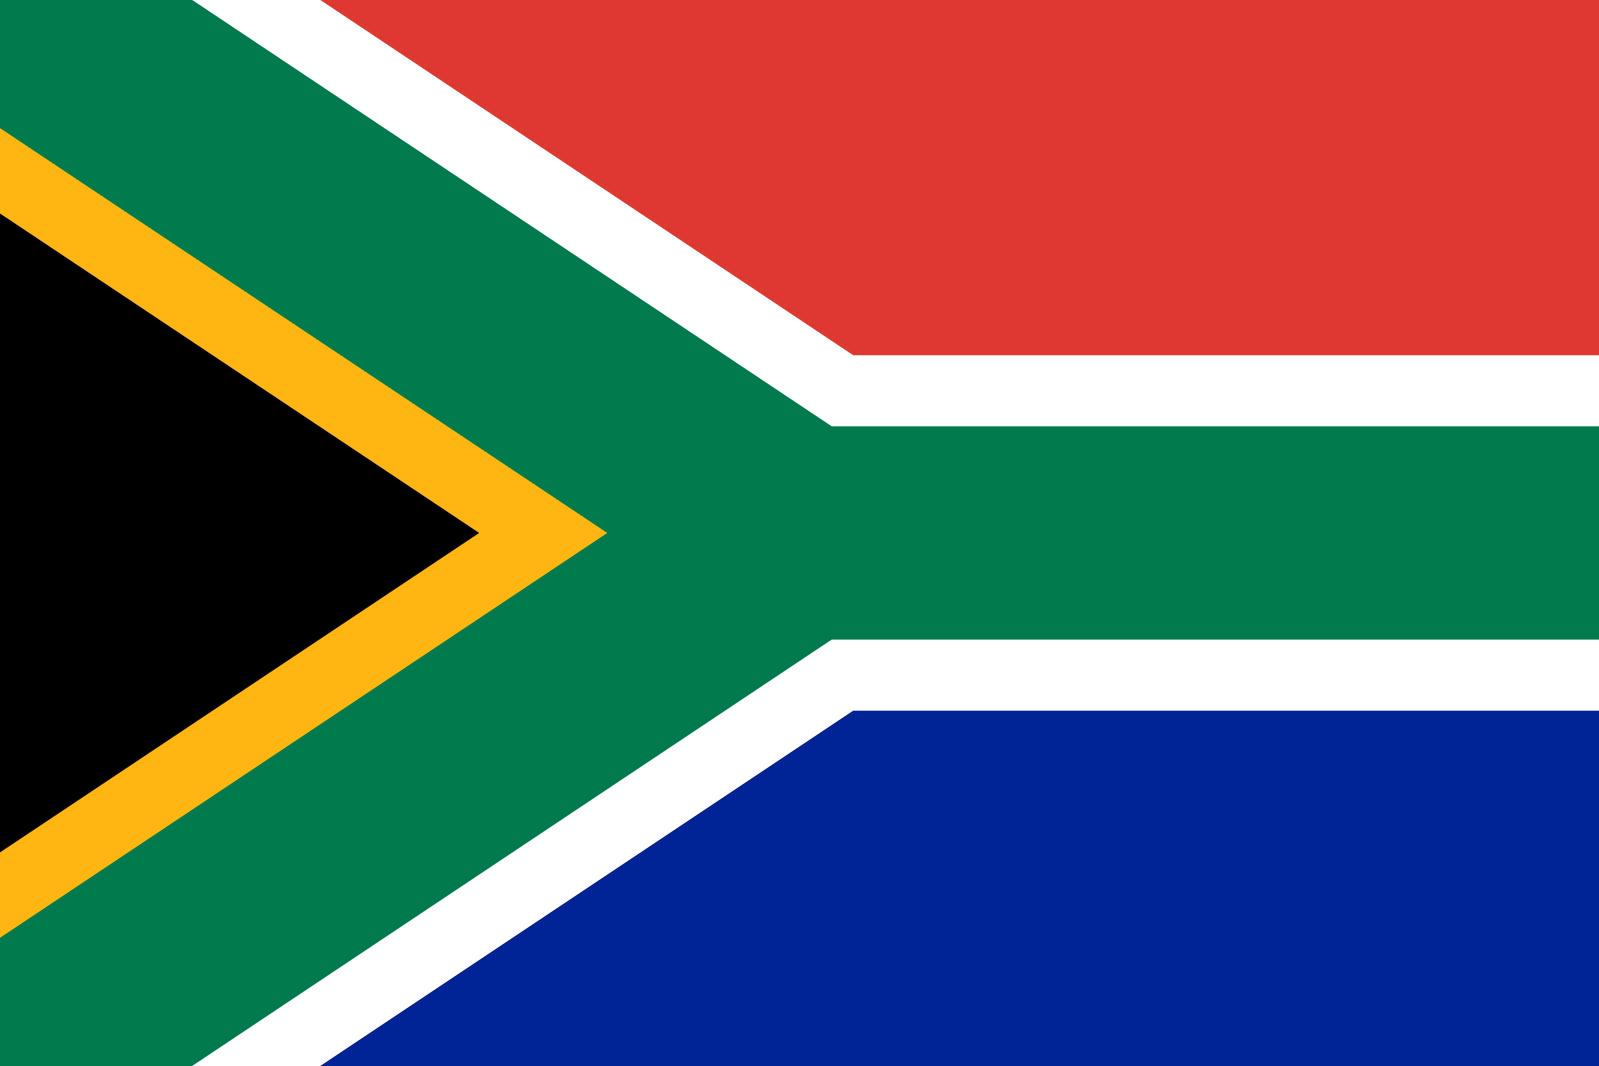 Bandeira sul-africana